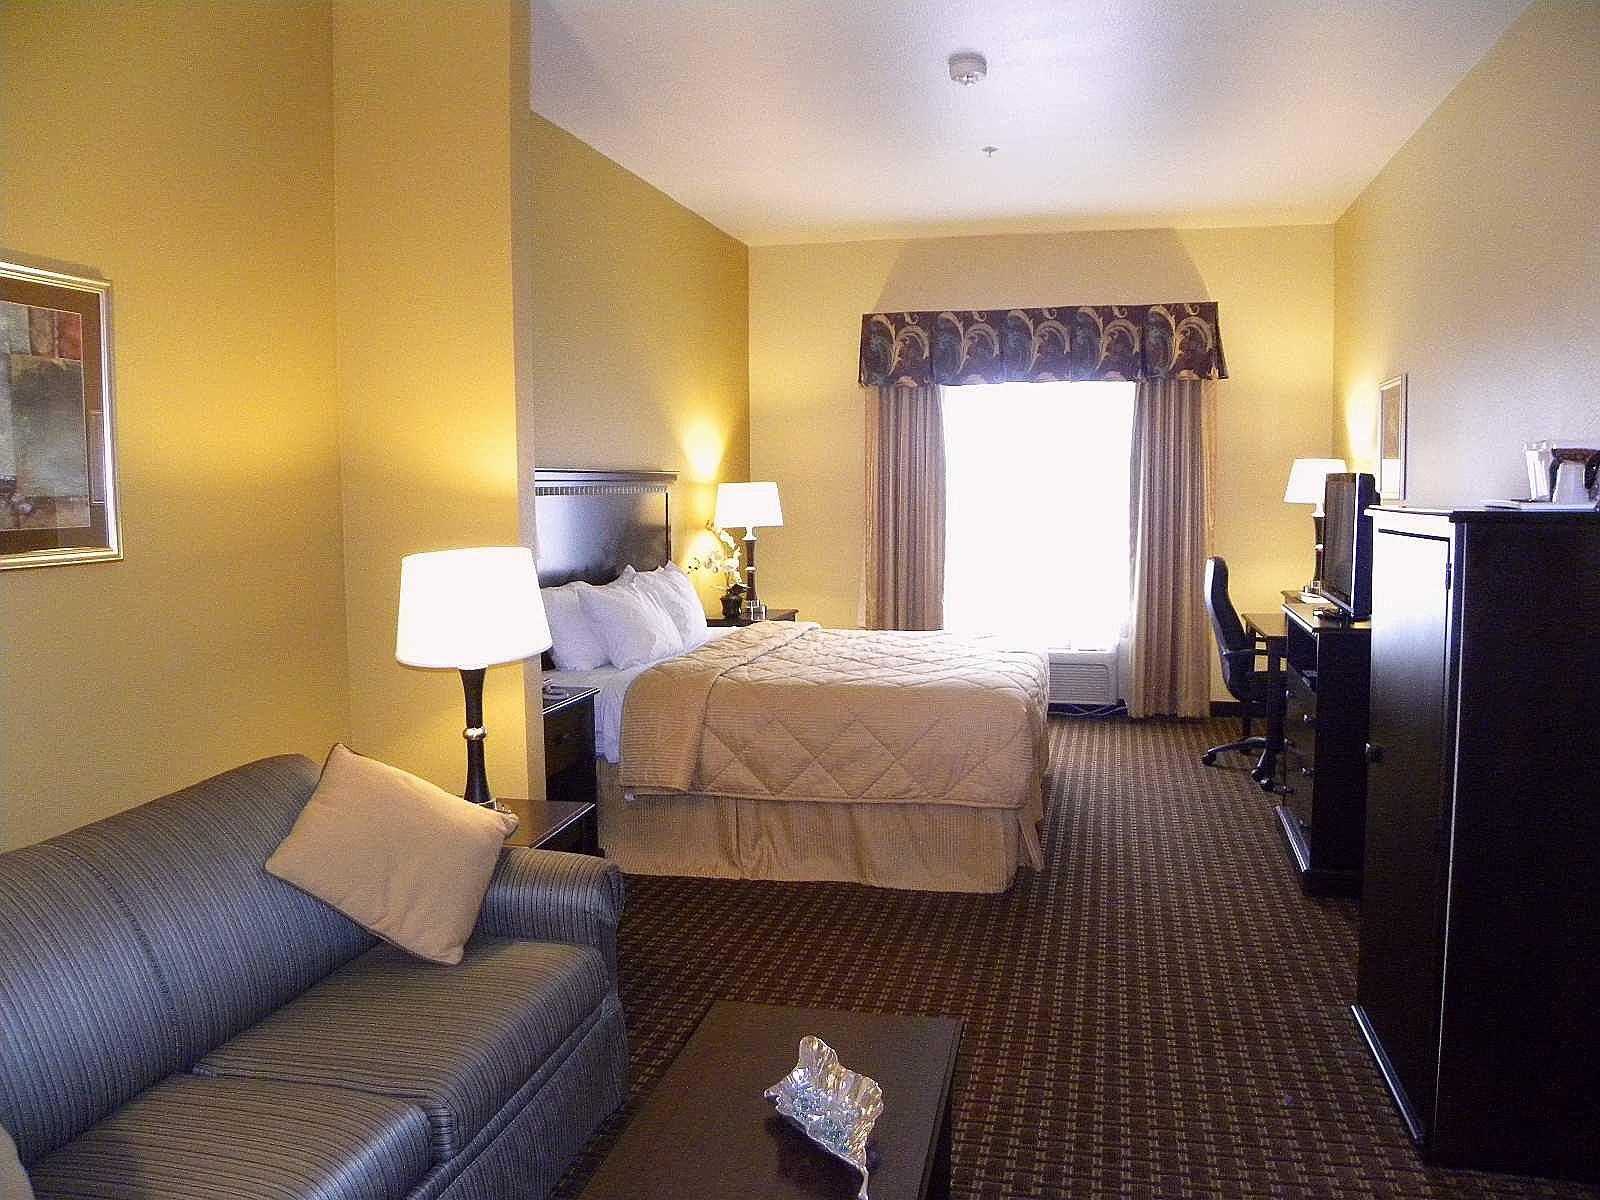 Comfort Inn Suites King size bed room